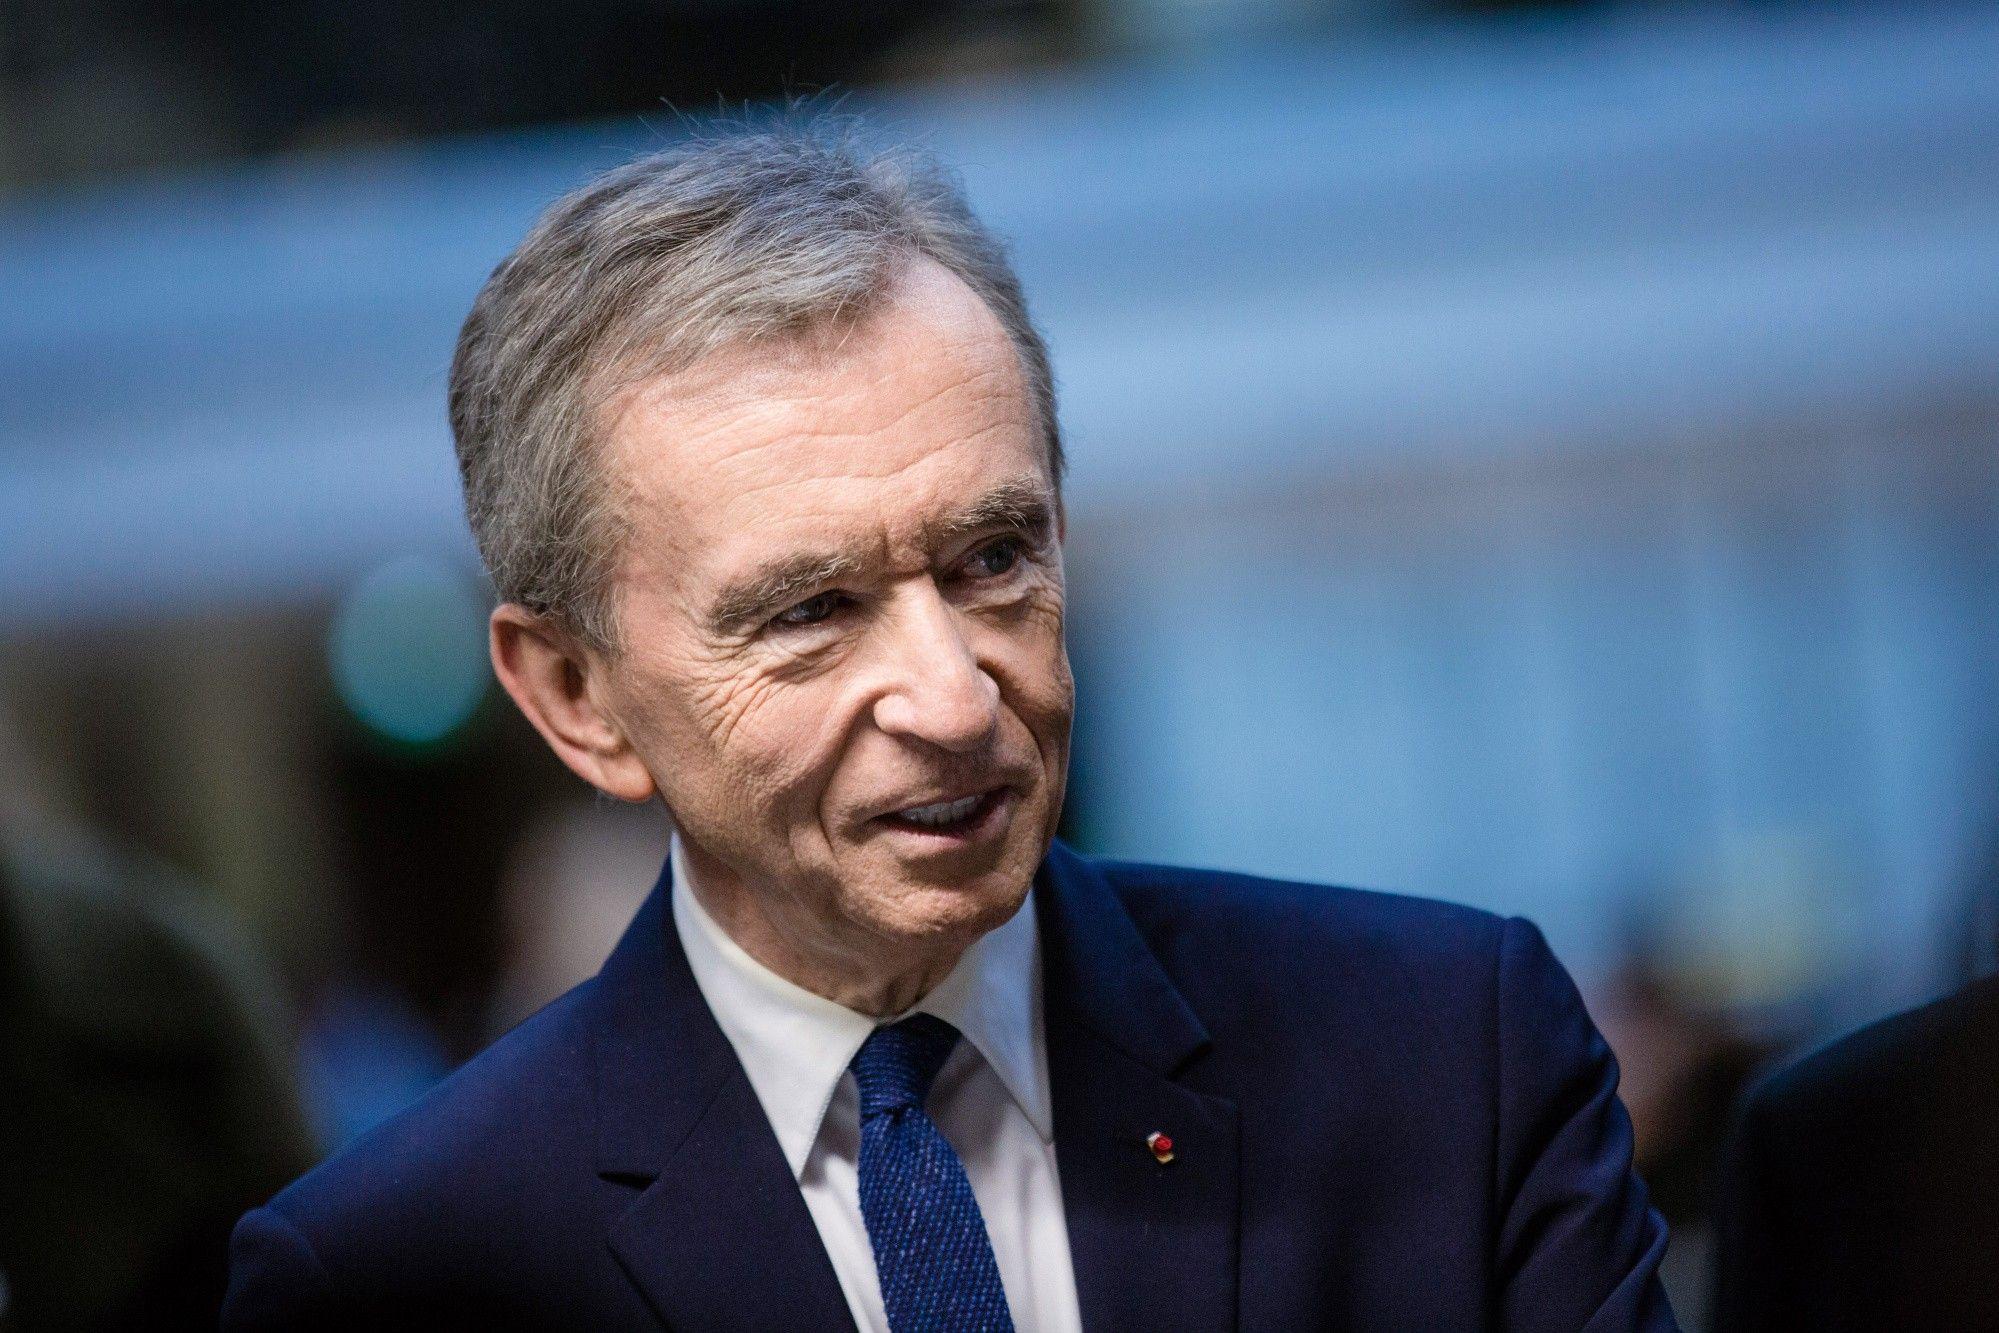 LVMH Moet Hennessy Louis Vuitton SE Chief Executive Officer Bernard Arnault Inaugurates LVMH Start-up Accelerator